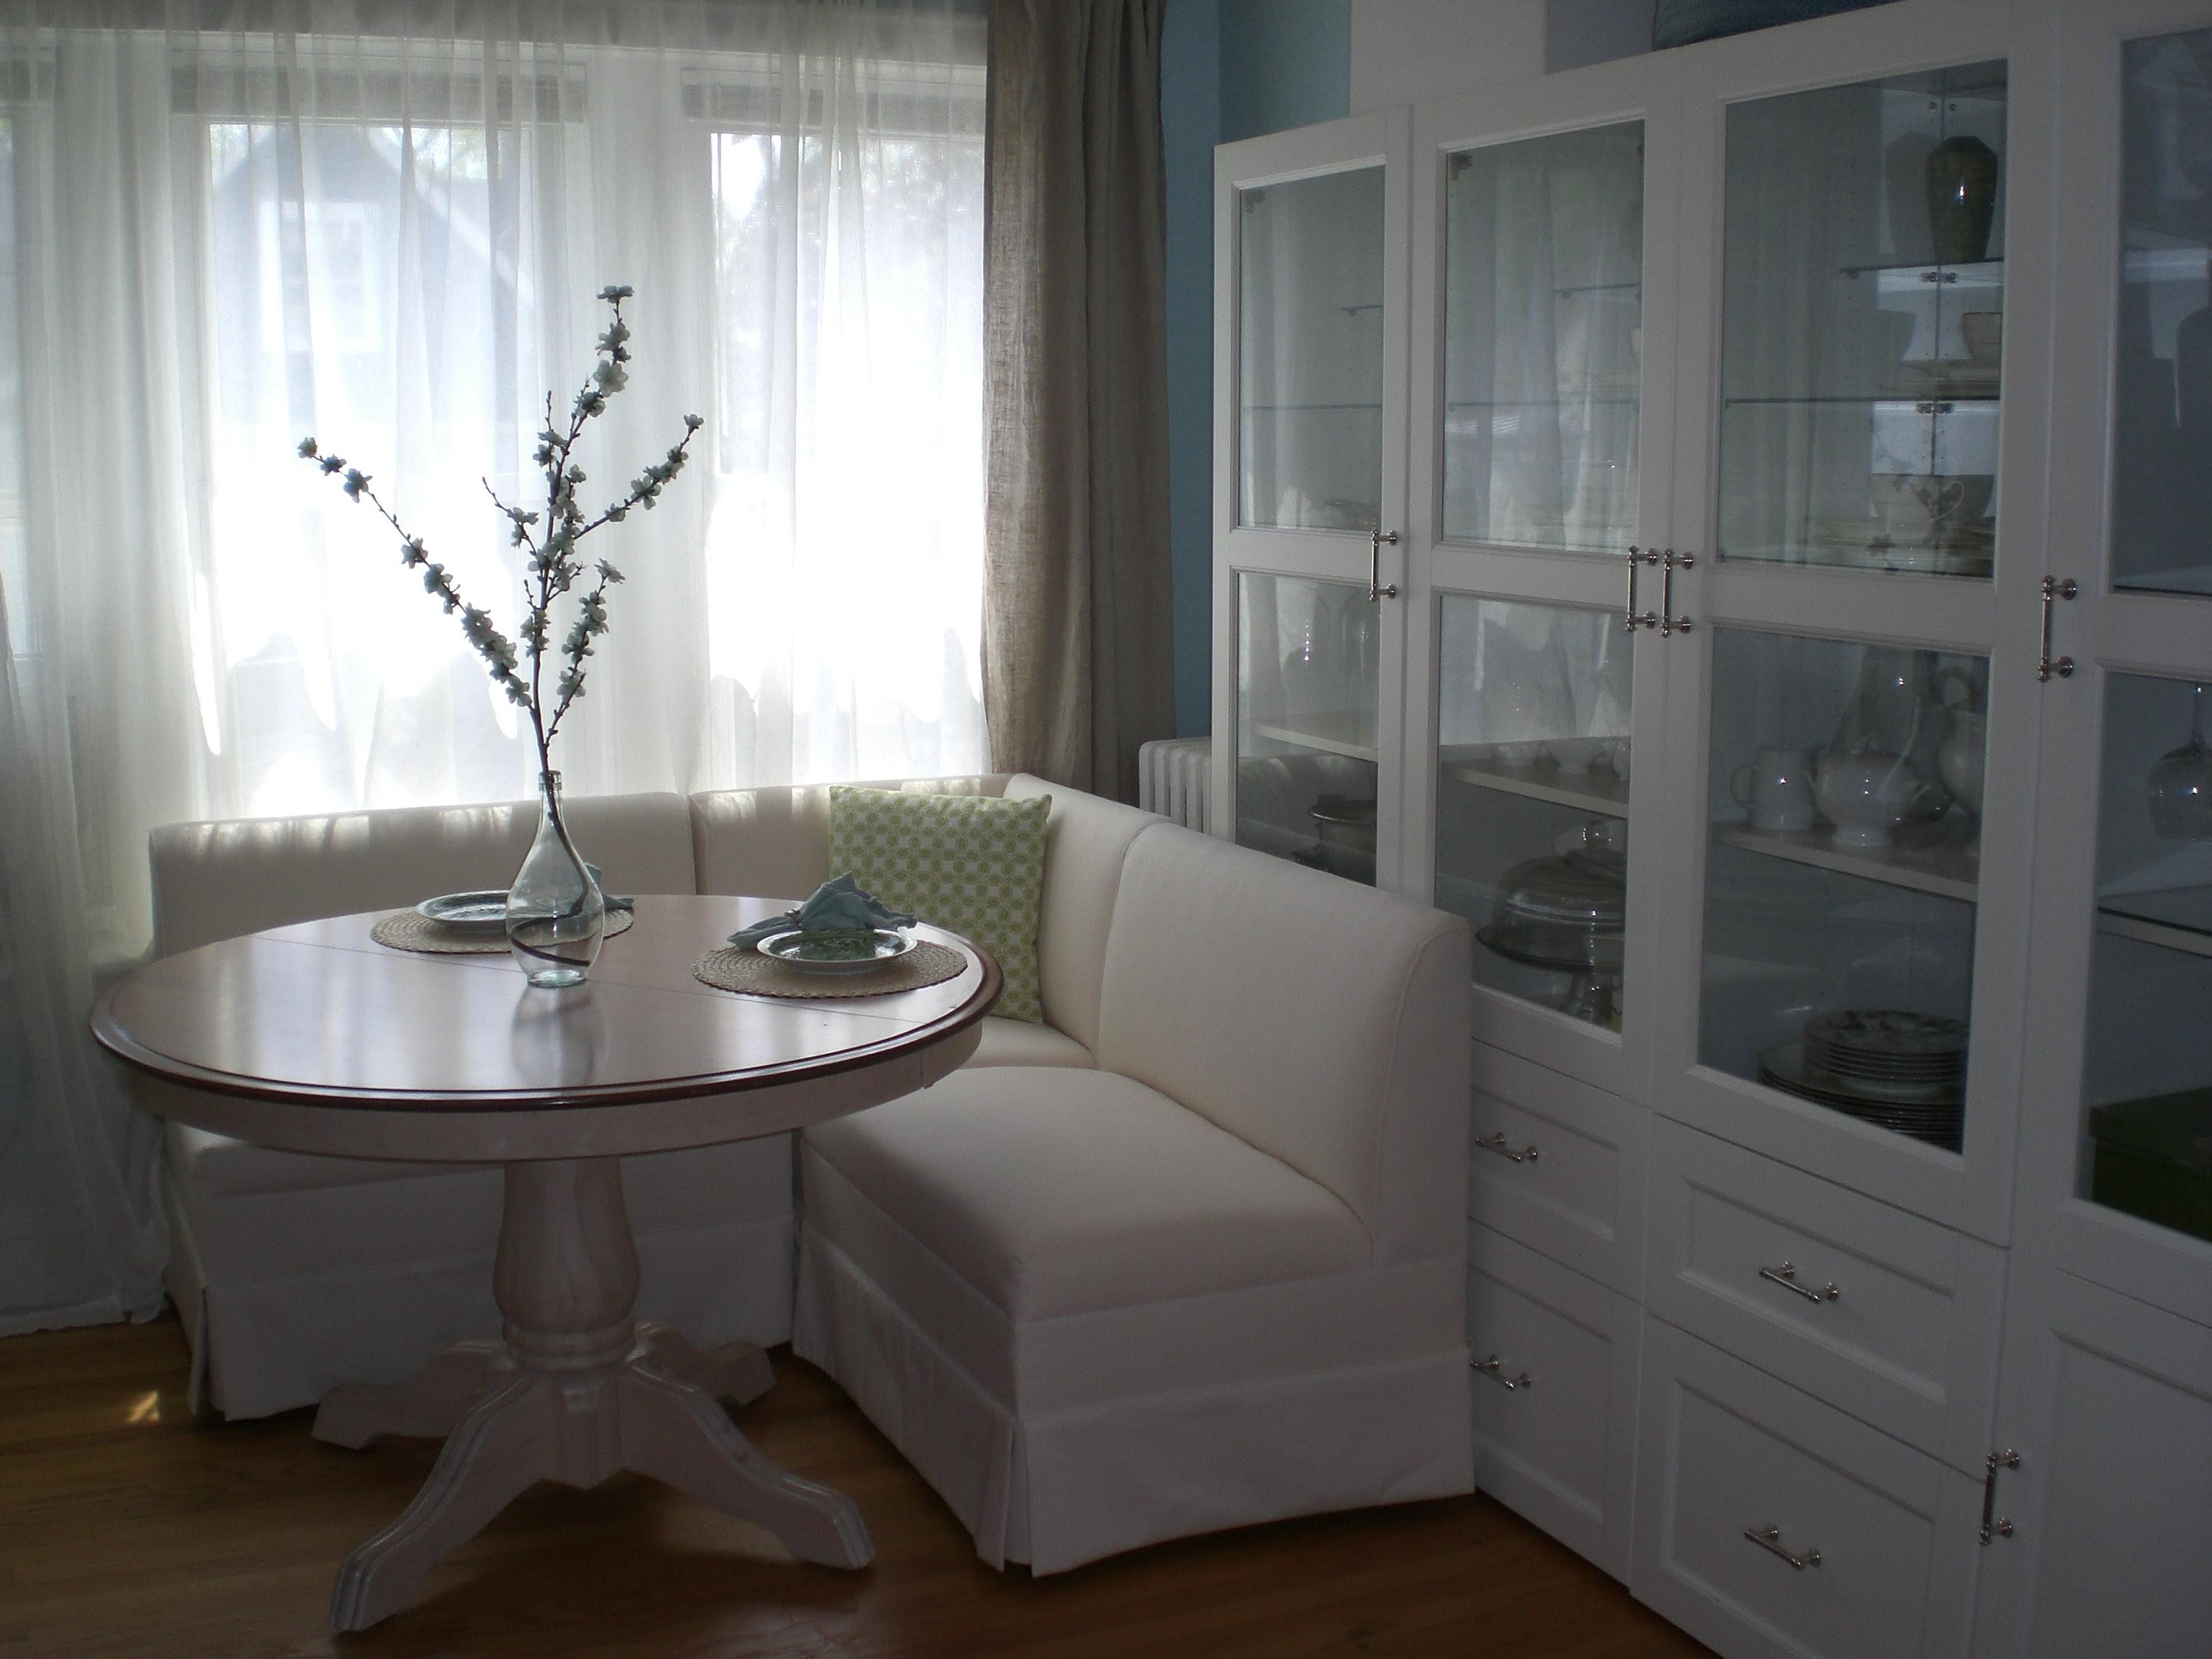 Dining Room Sets Craigslist